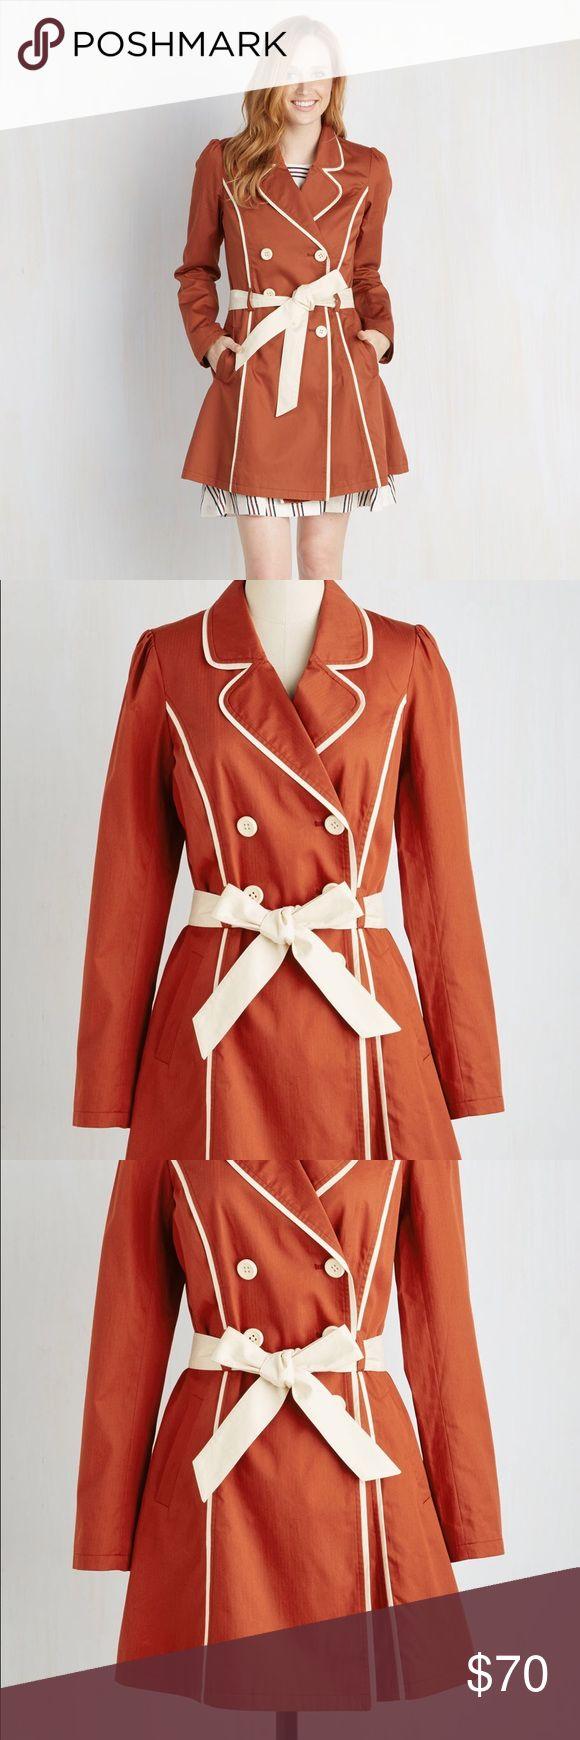 Modcloth East Coast Tour Coat in Paprika NWOT - Large ModCloth Jackets & Coats Trench Coats